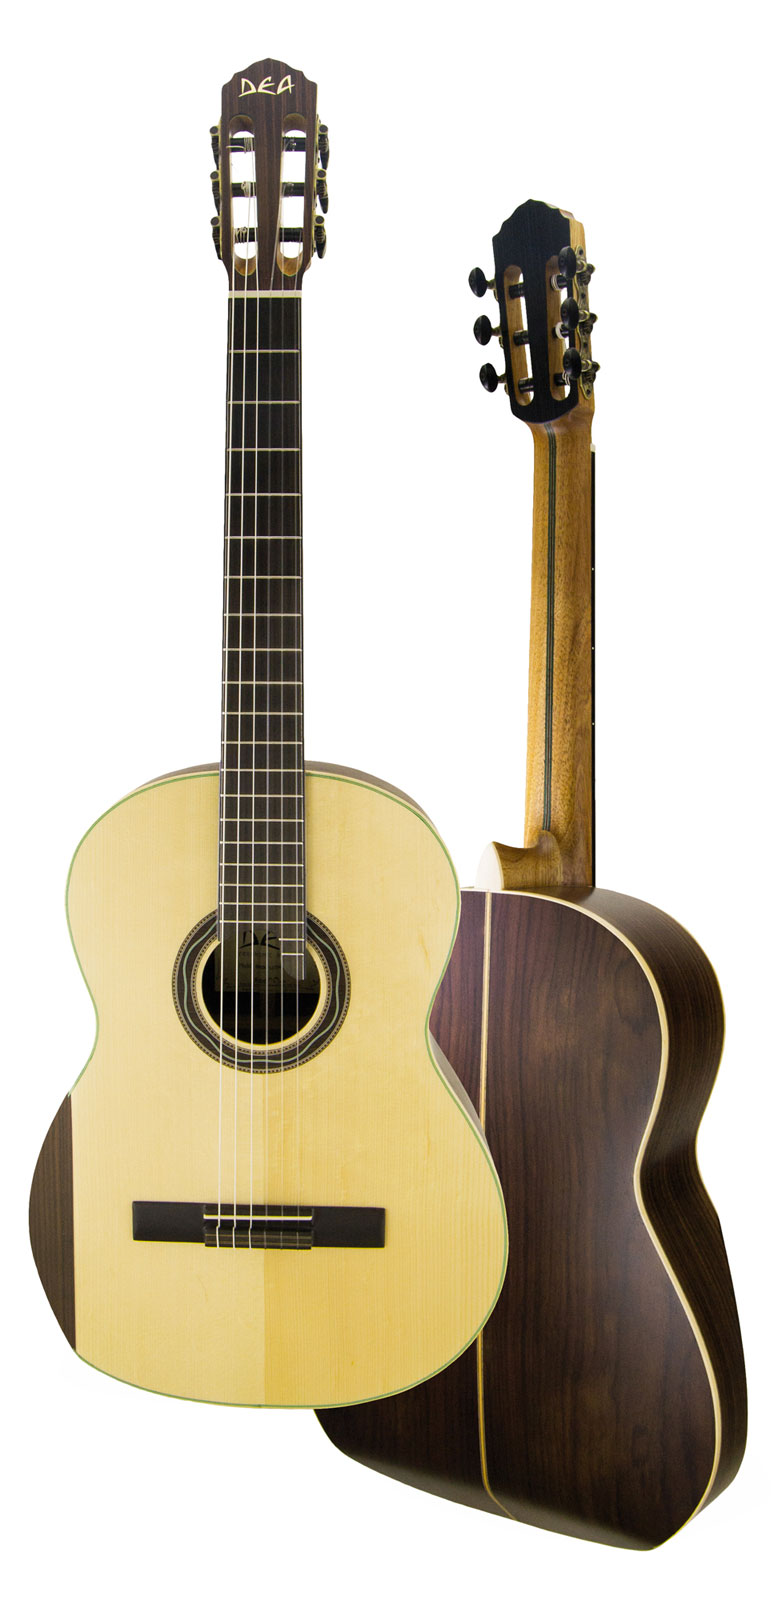 Dea Ergonomic Ergonomic Luthier Natural Gloss Avec Etui